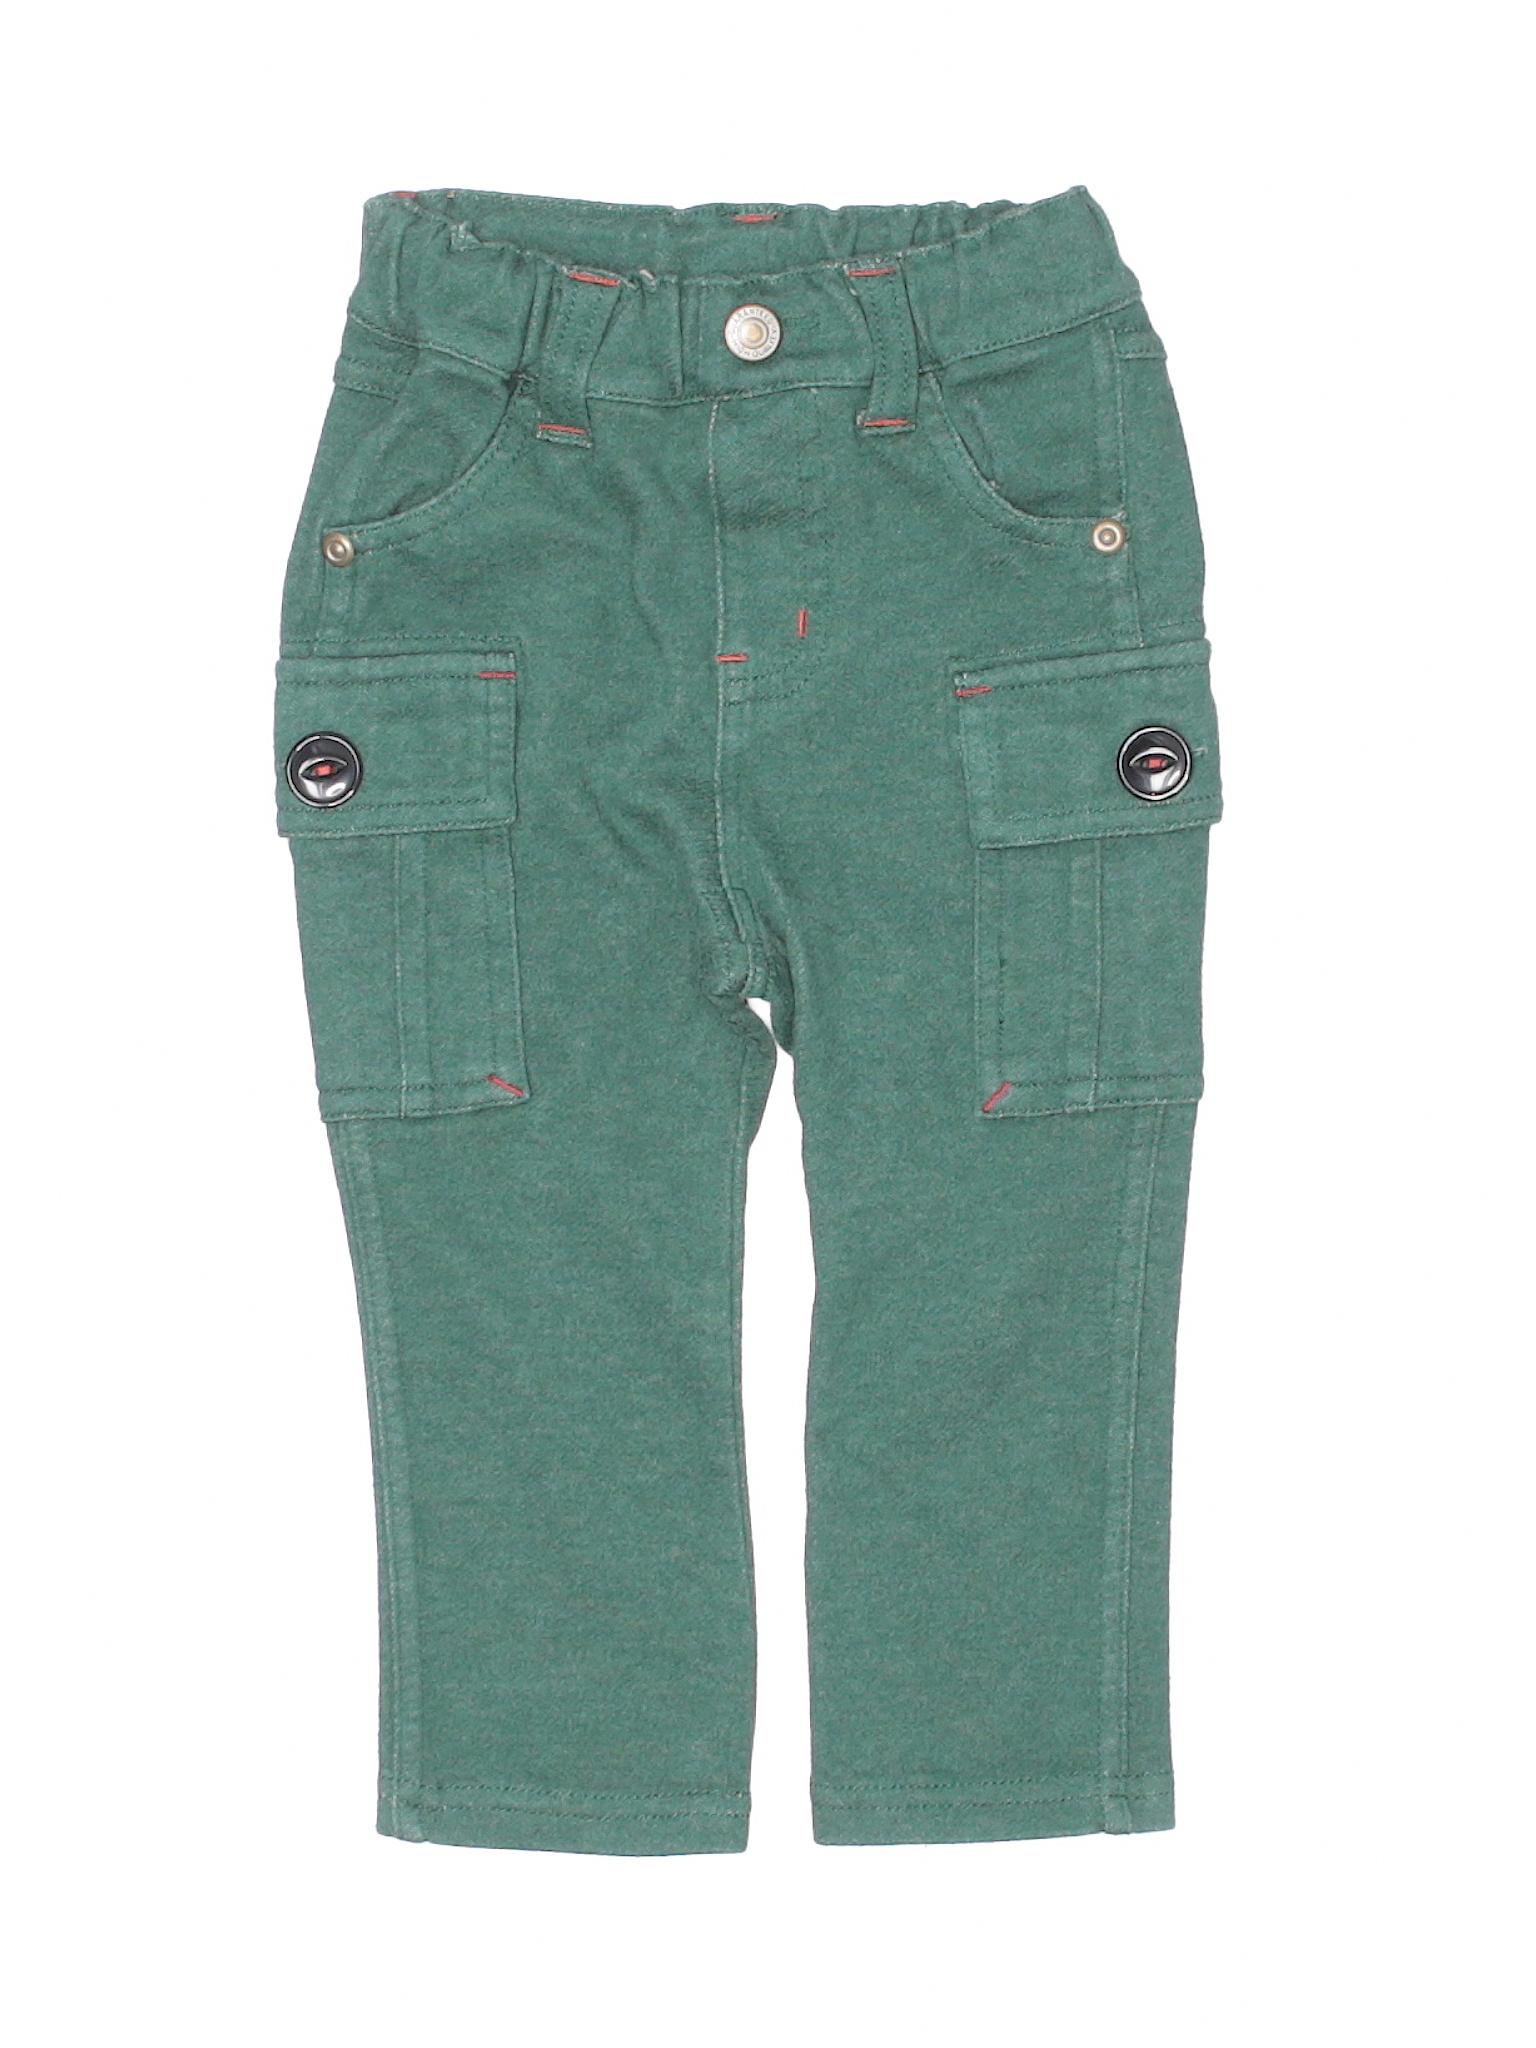 1e3ece7a76 Bit'z Kids 100% Cotton Solid Green Cargo Pants Size 12-18 mo - 90 ...